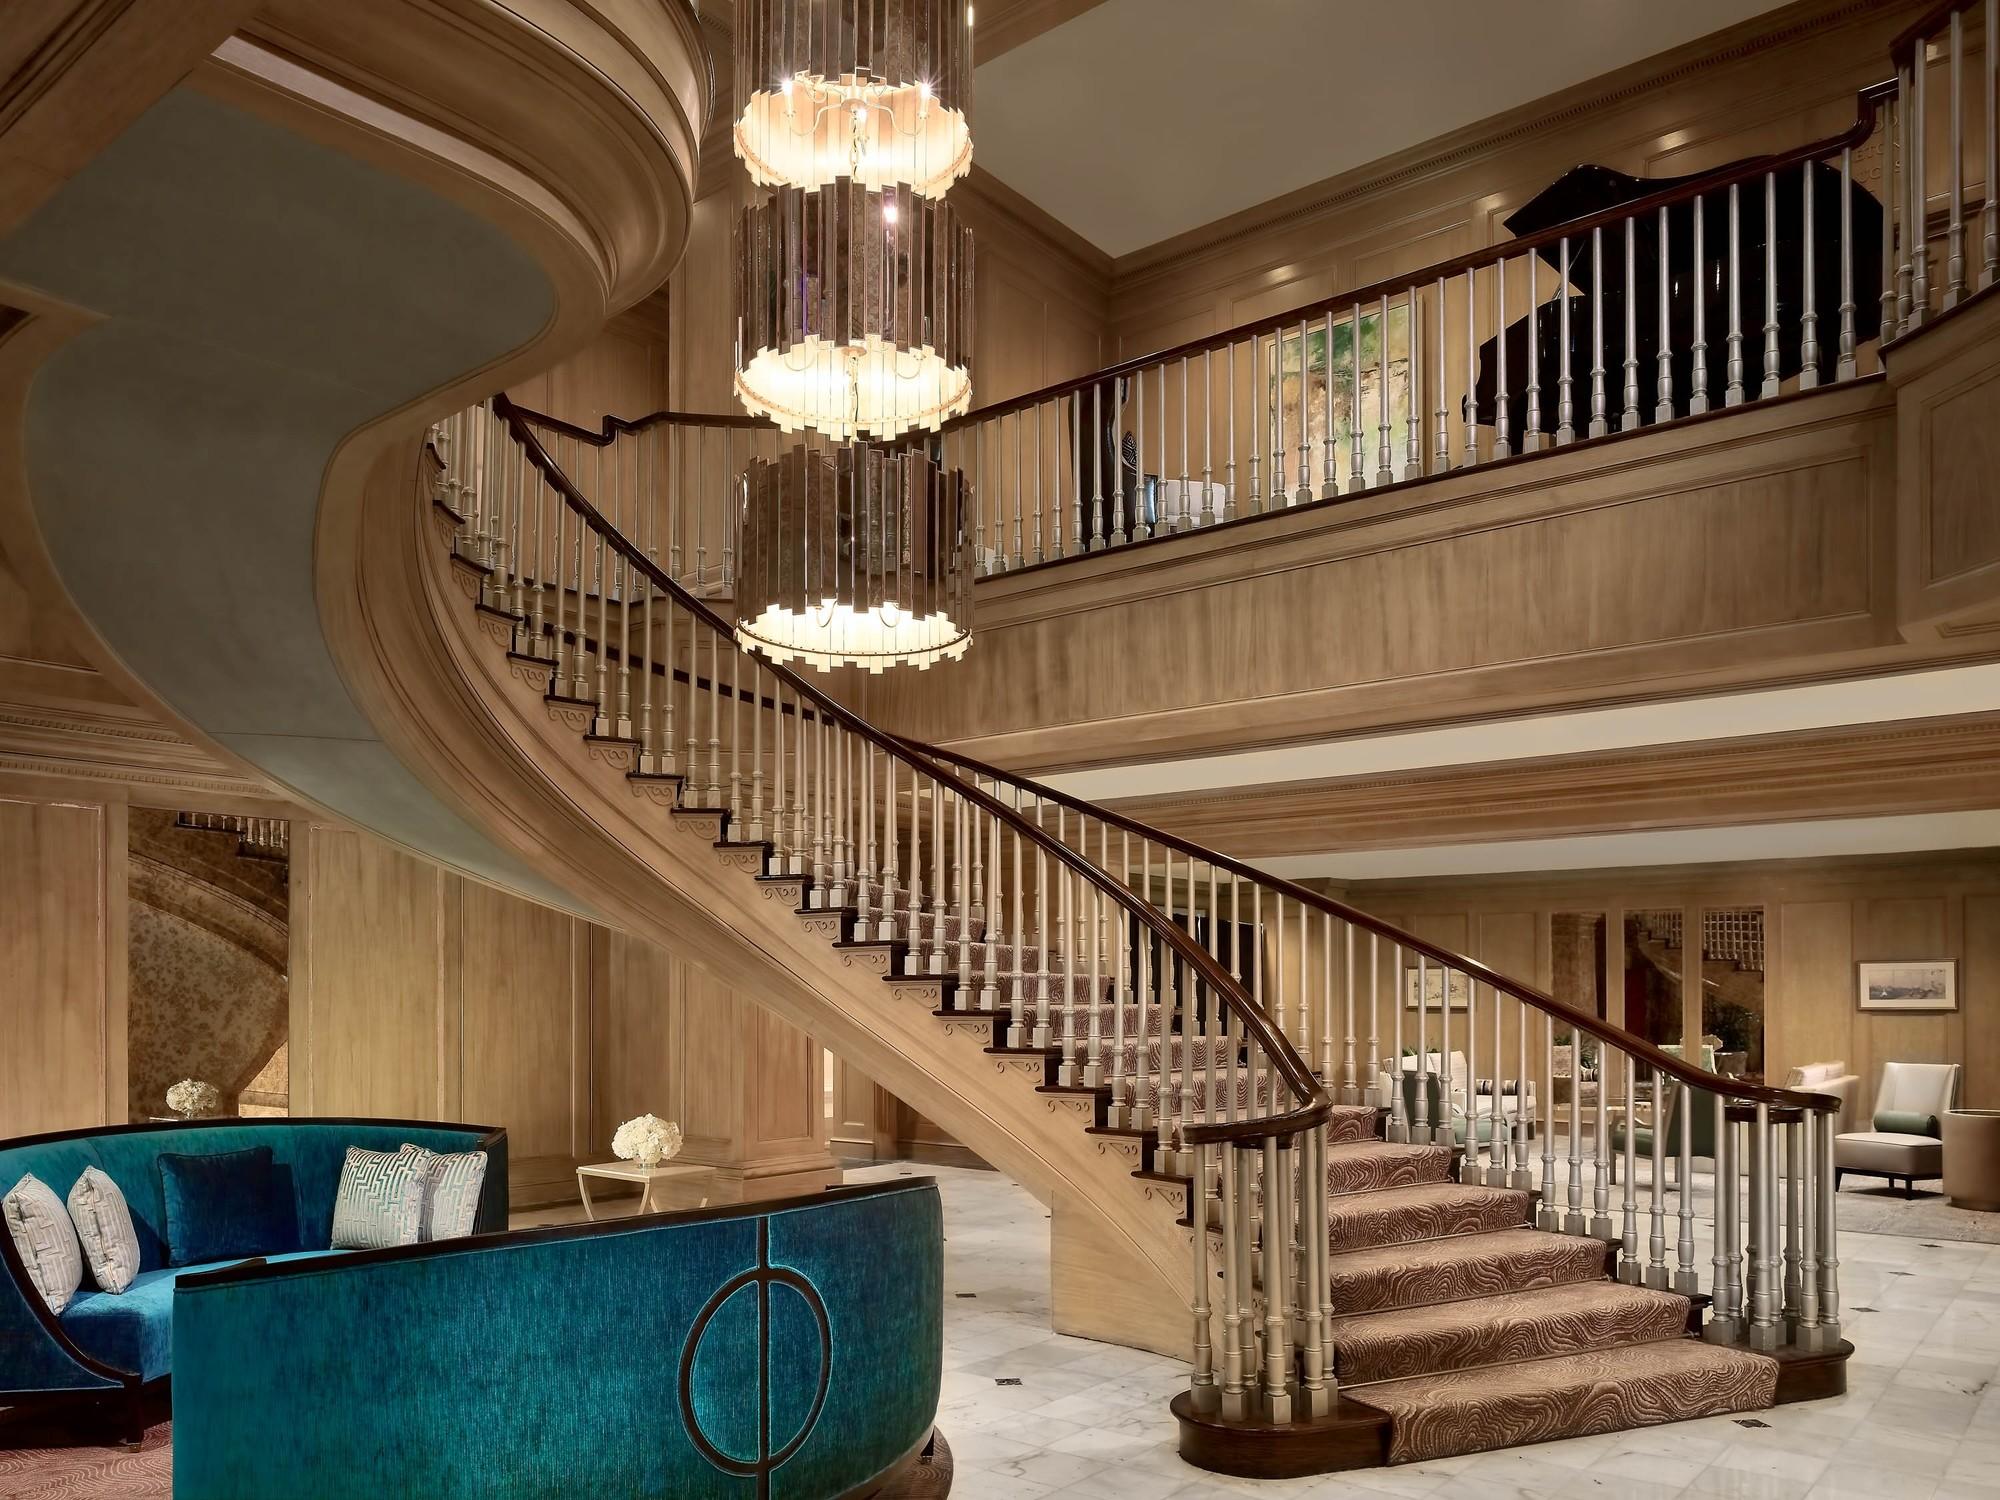 Royal Sonesta Harbor Court Baltimore - Staircase in Lobby